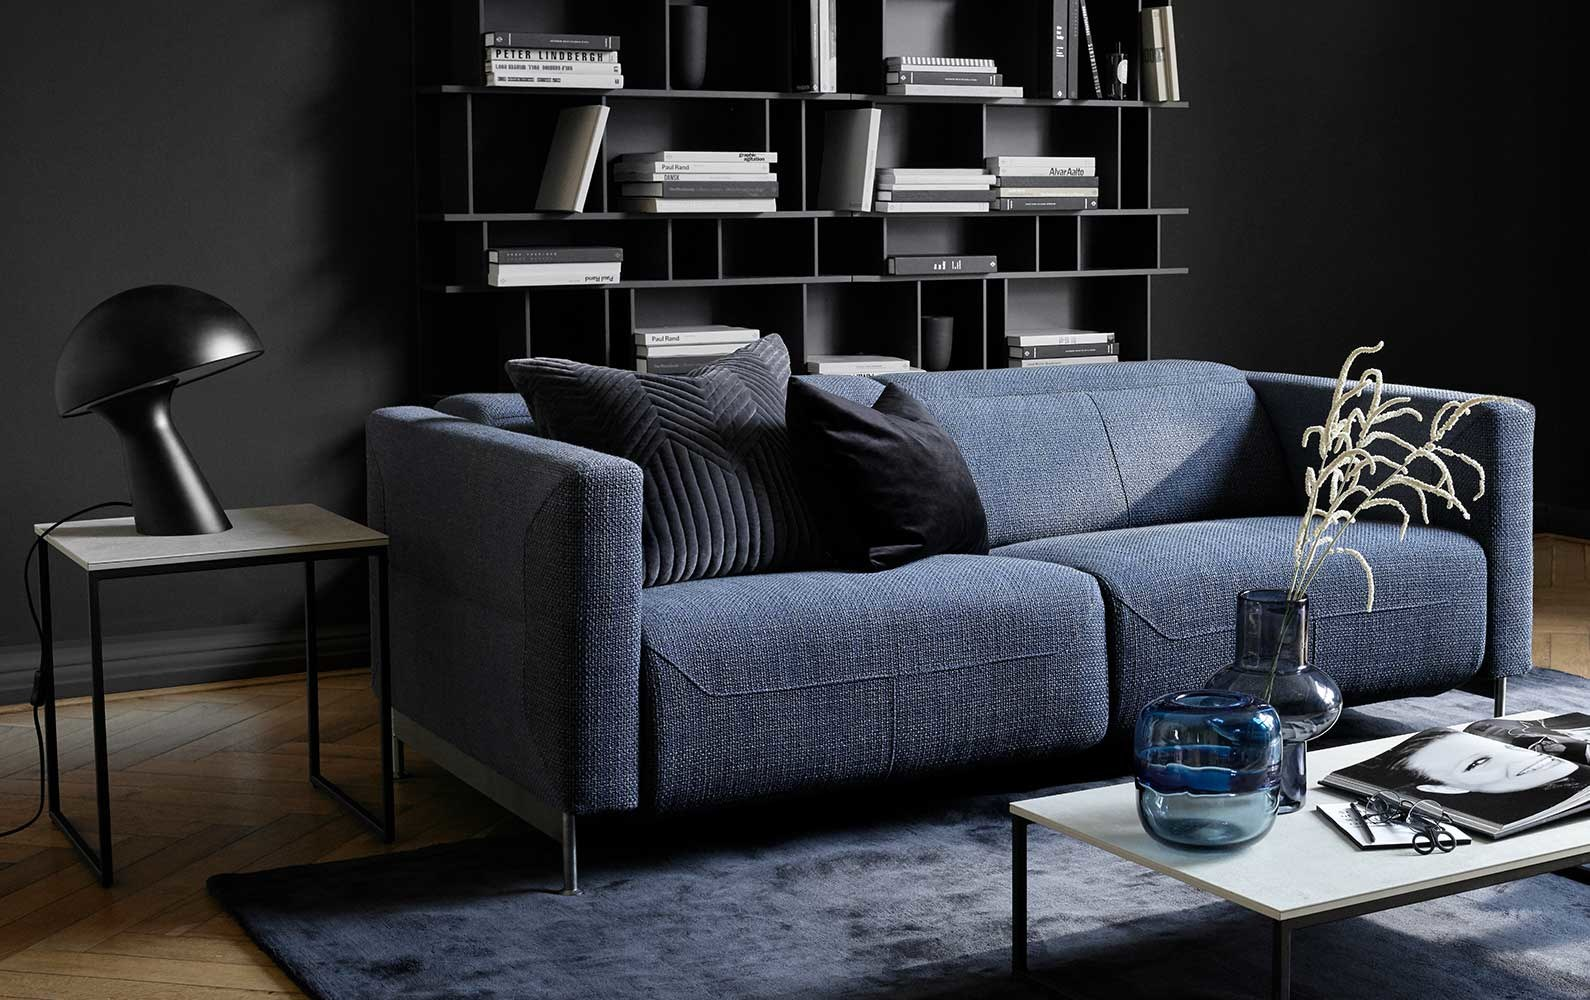 Sofás reclinables - Sofá reclinable Parma con módulo chaise-longue